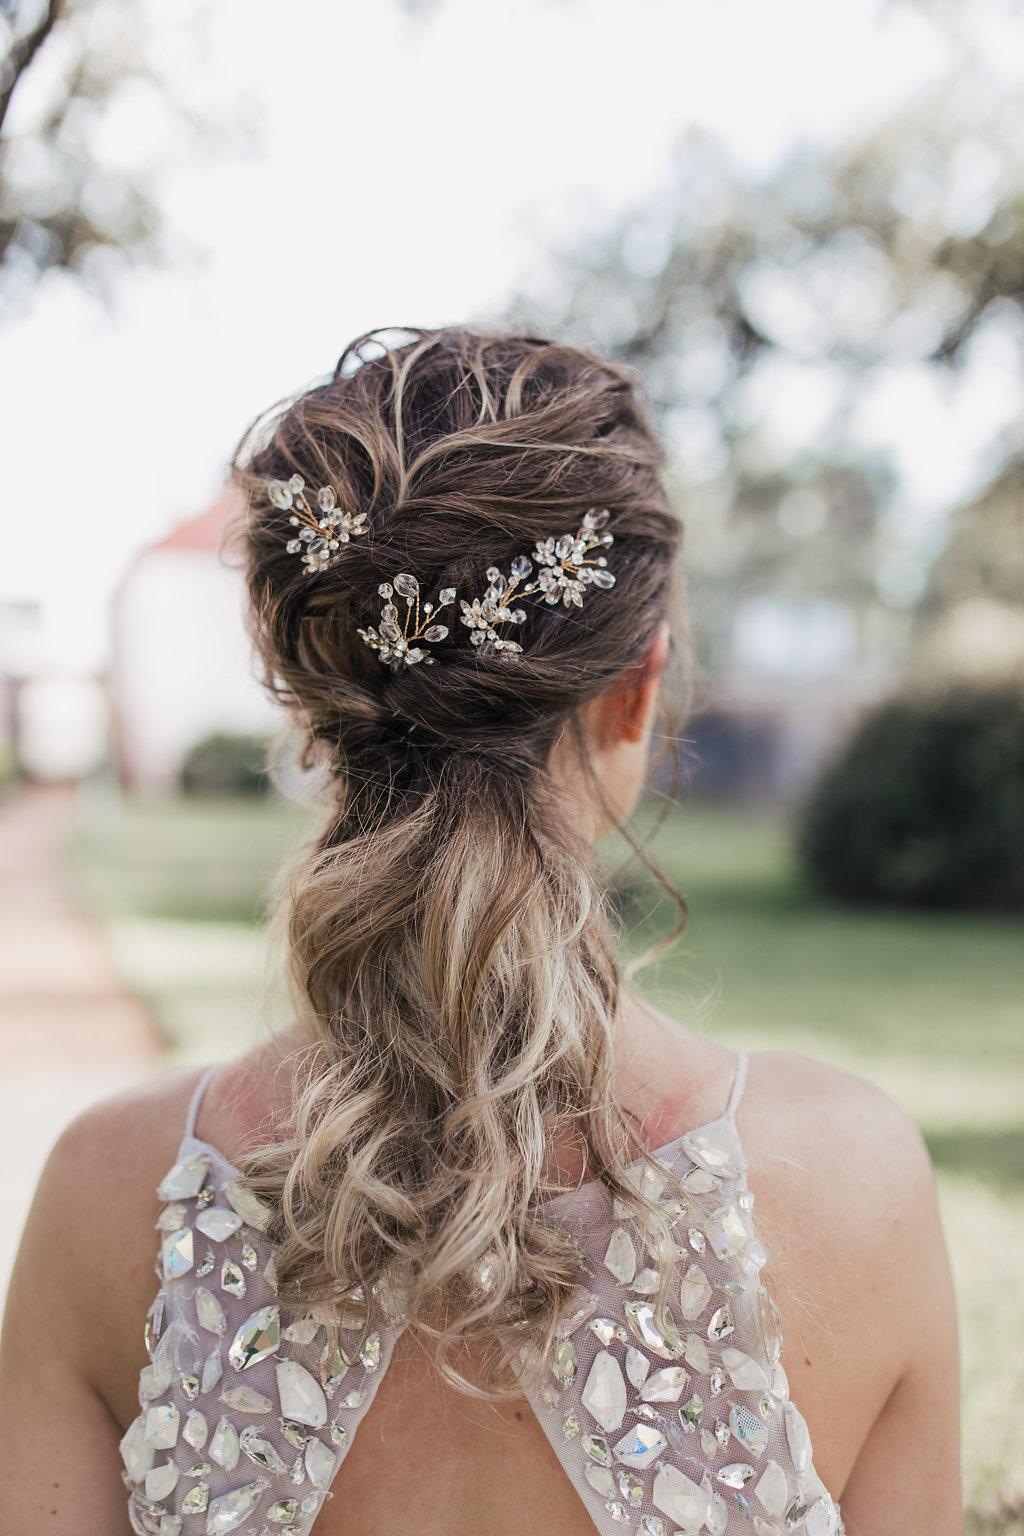 glam wedding hair details - photo by Alondra Vega Photography http://ruffledblog.com/jewel-toned-wedding-ideas-with-a-surprise-proposal